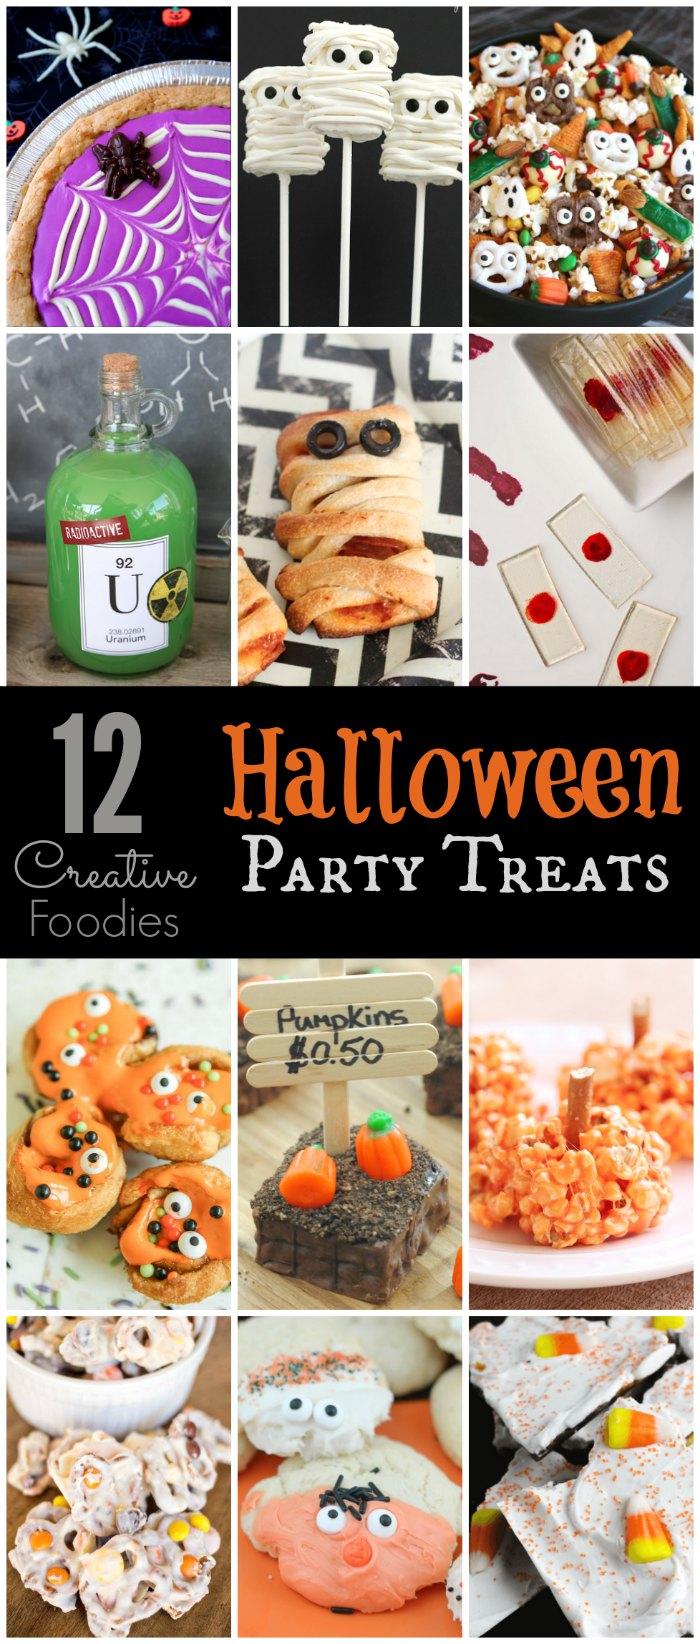 12 fun and spooky halloween treats